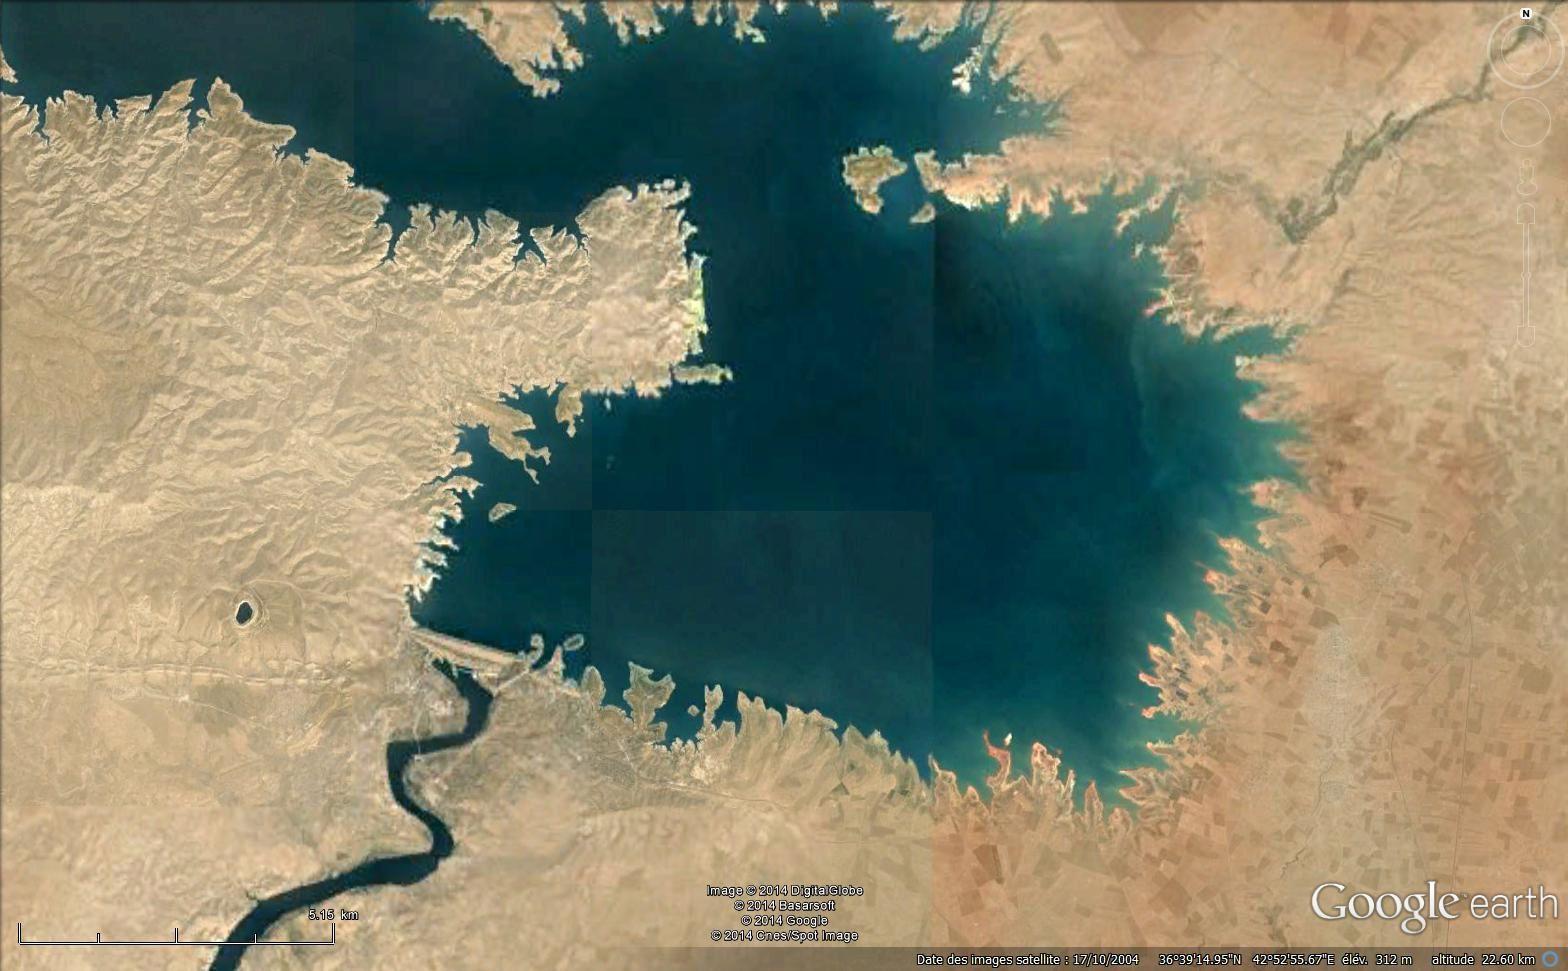 Le barrage de Mossoul sur le Tigre (Google earth, 2004)